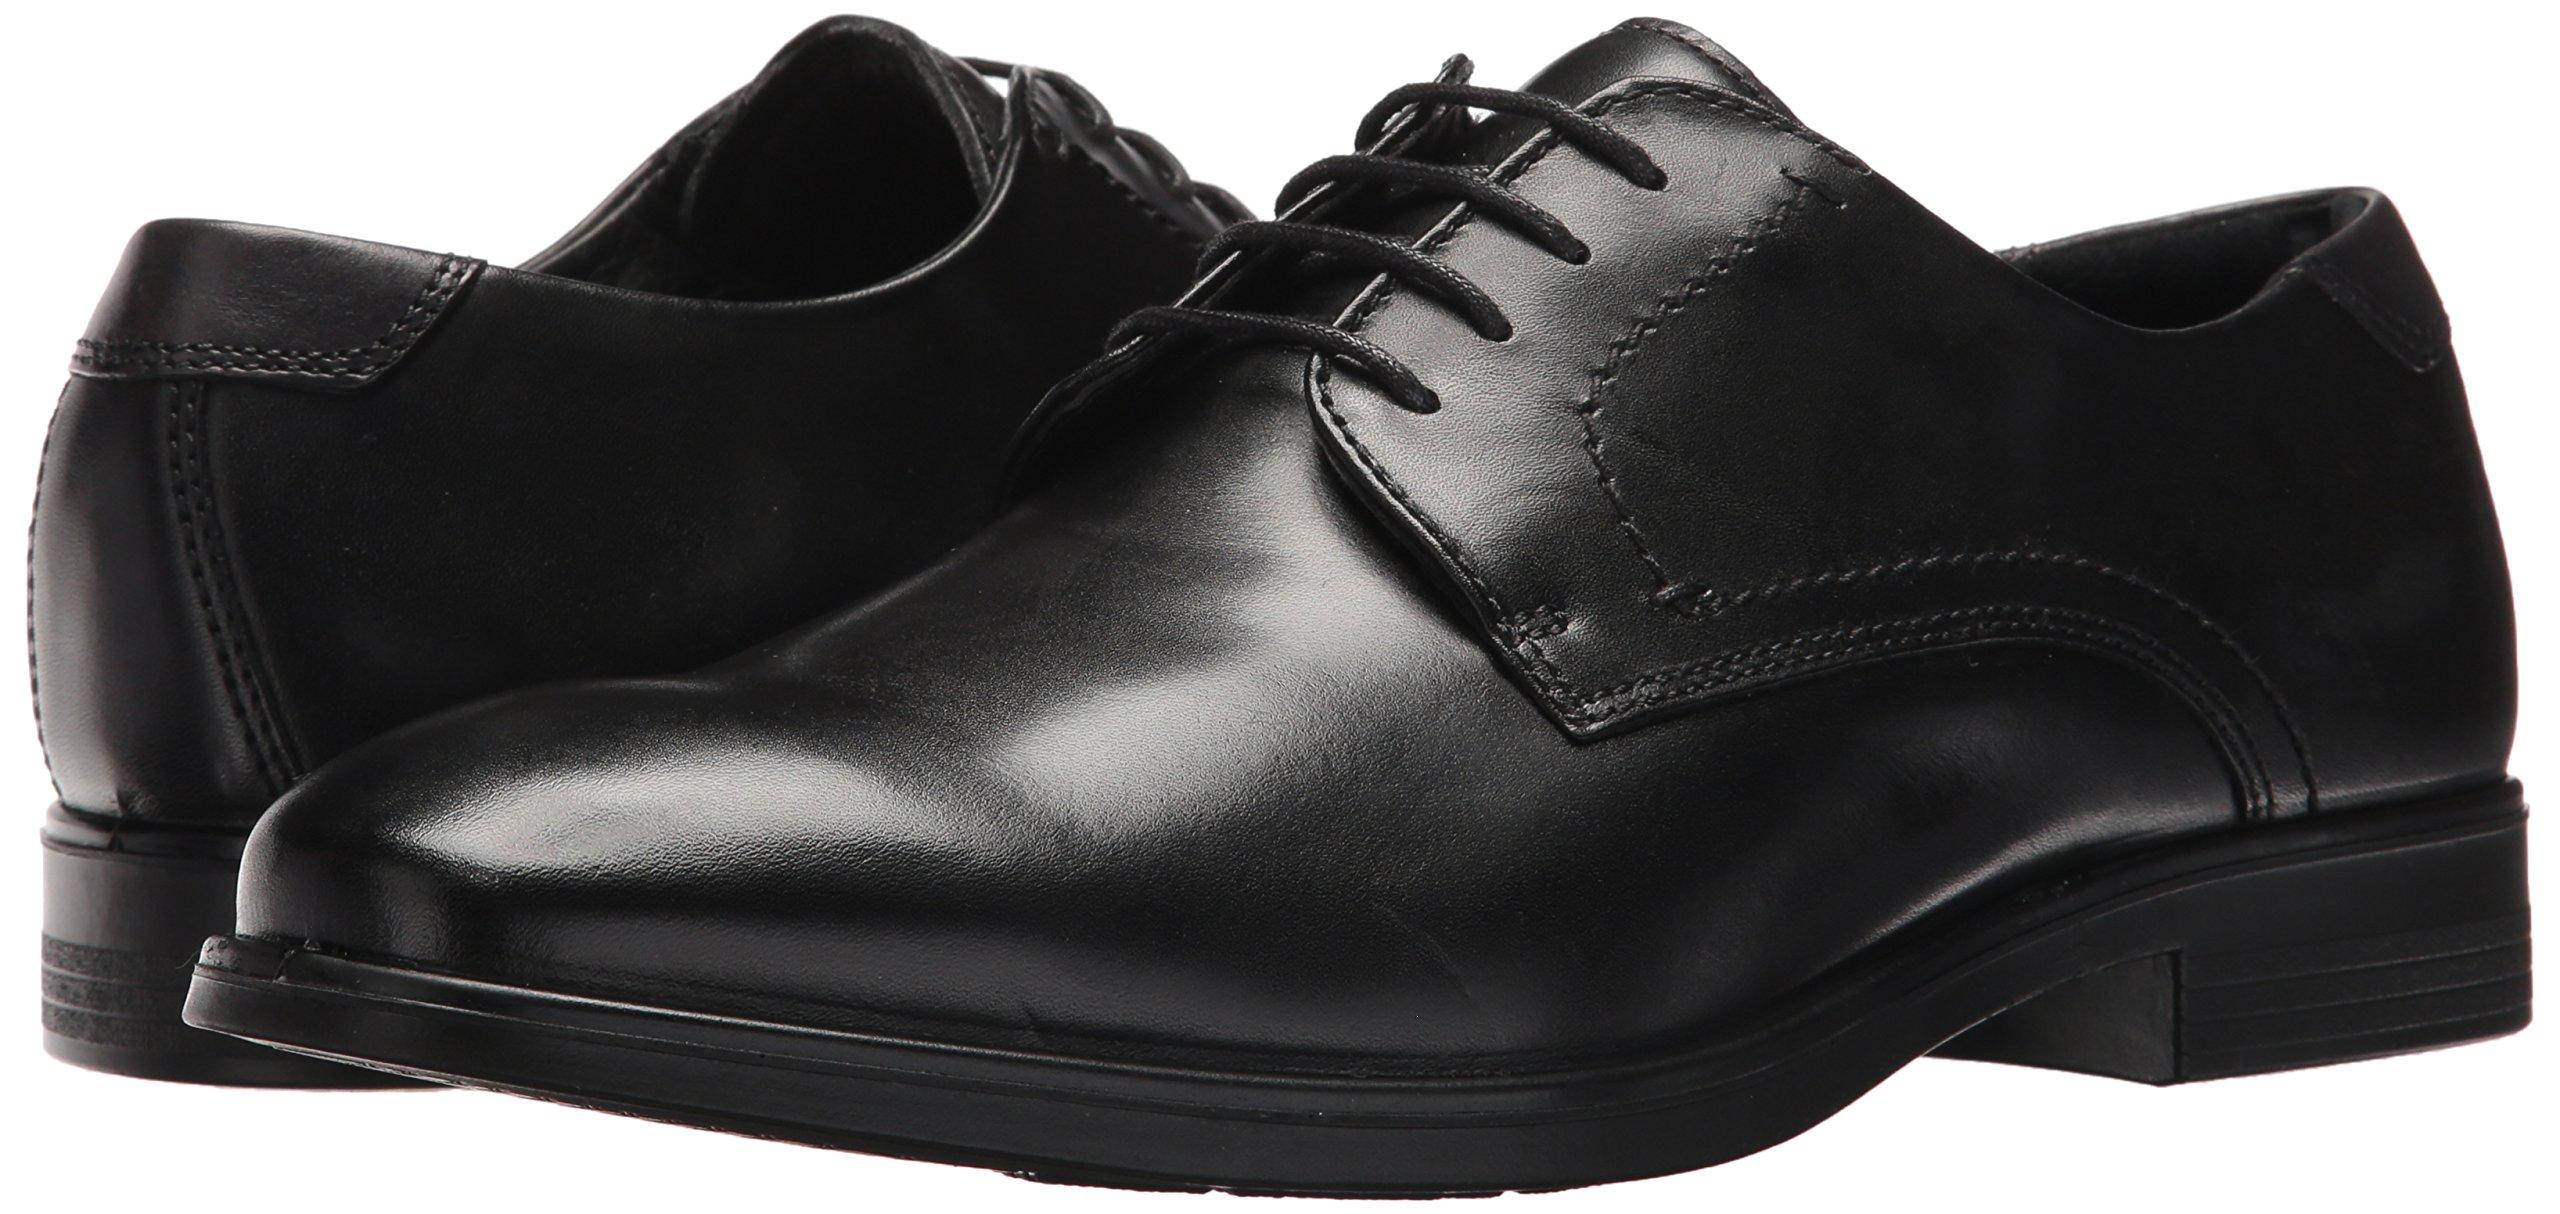 ECCO Men's Melbourne Tie Oxford, Black/Magnet, 43 EU/9-9.5 M US by ECCO (Image #6)